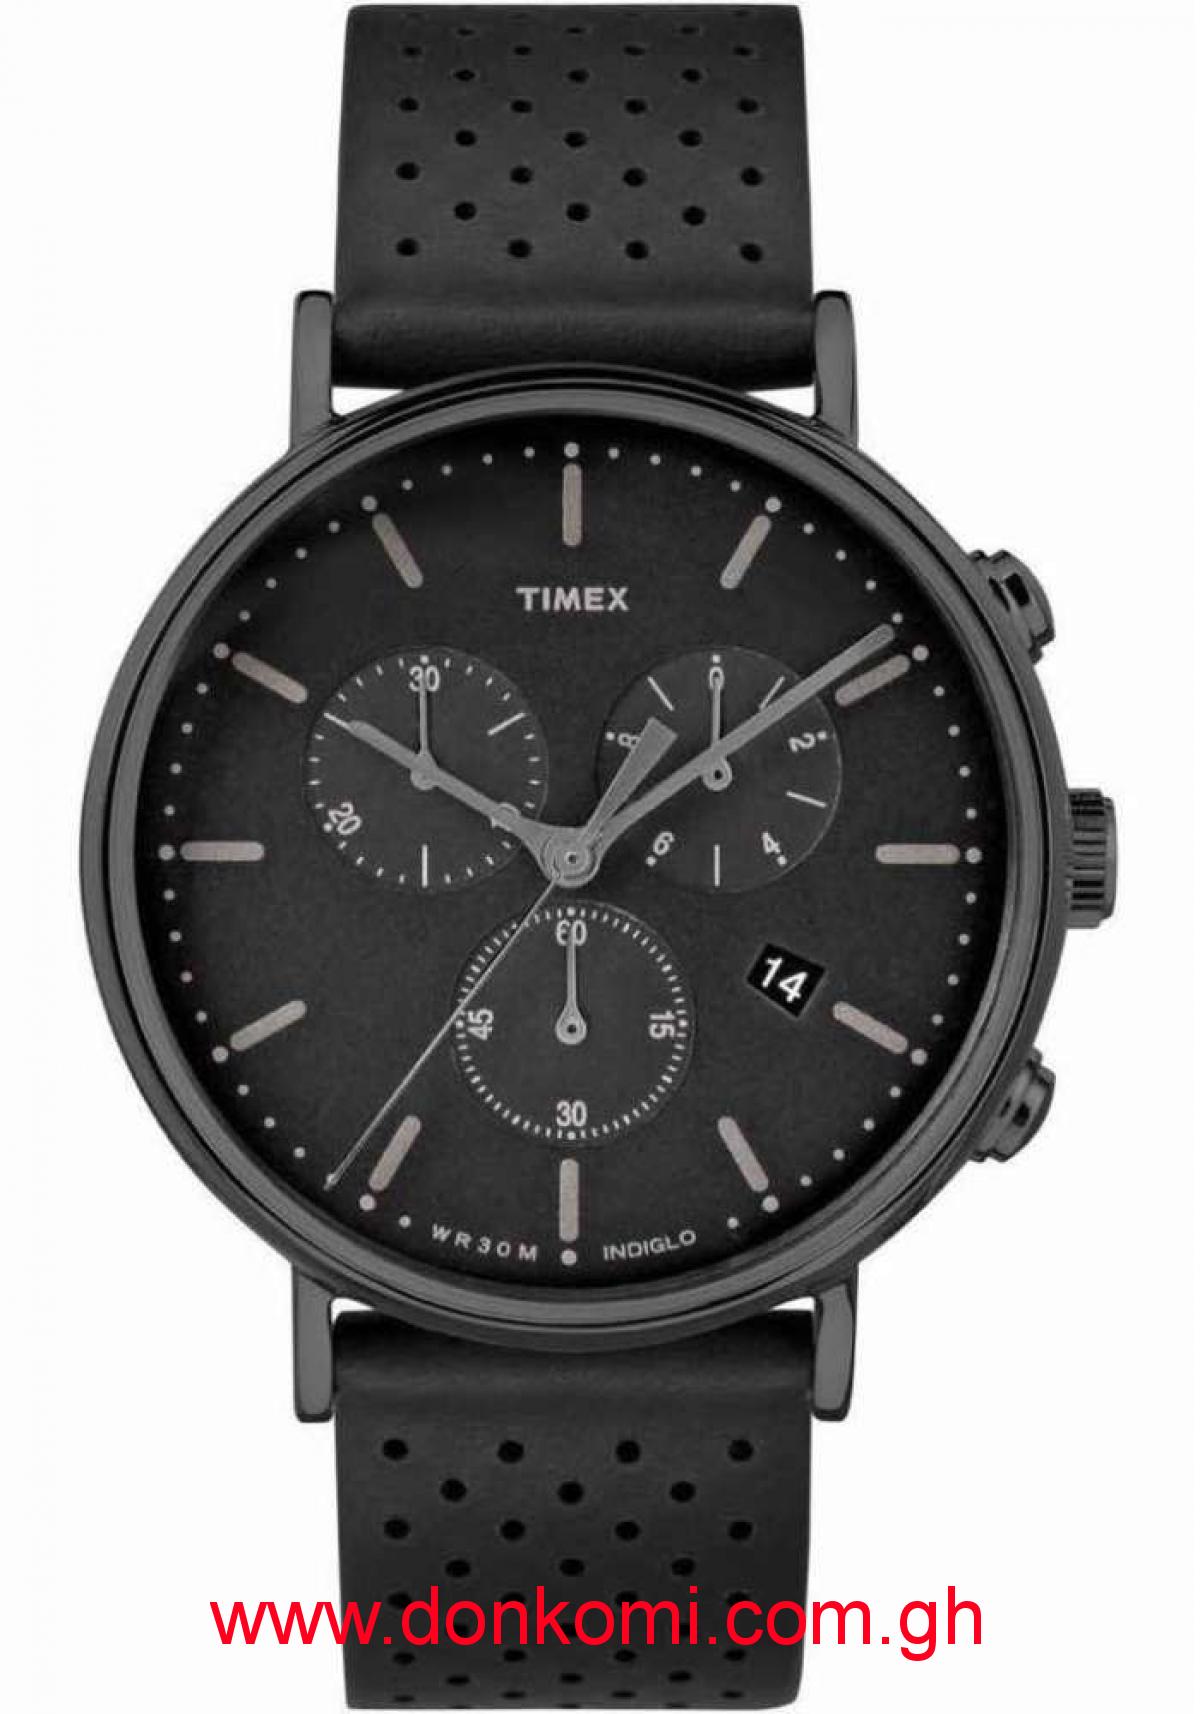 Timex black leather watch